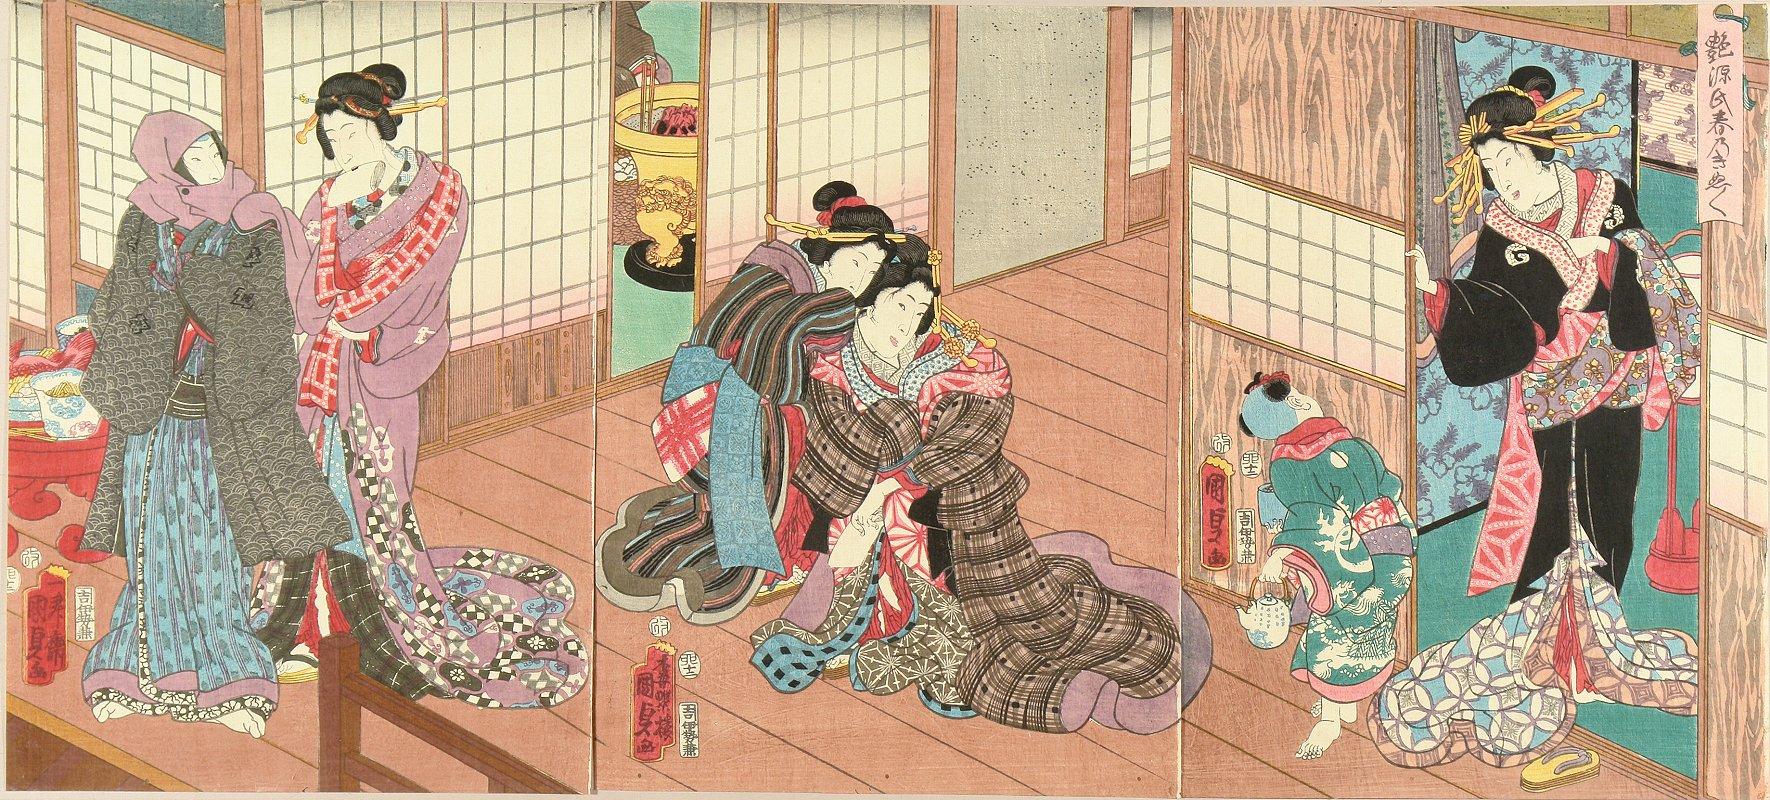 KUNISADA II <i>Tsuya Genji haru no kinubginu</i> (Amorous Genji, separation of the spring), triptych